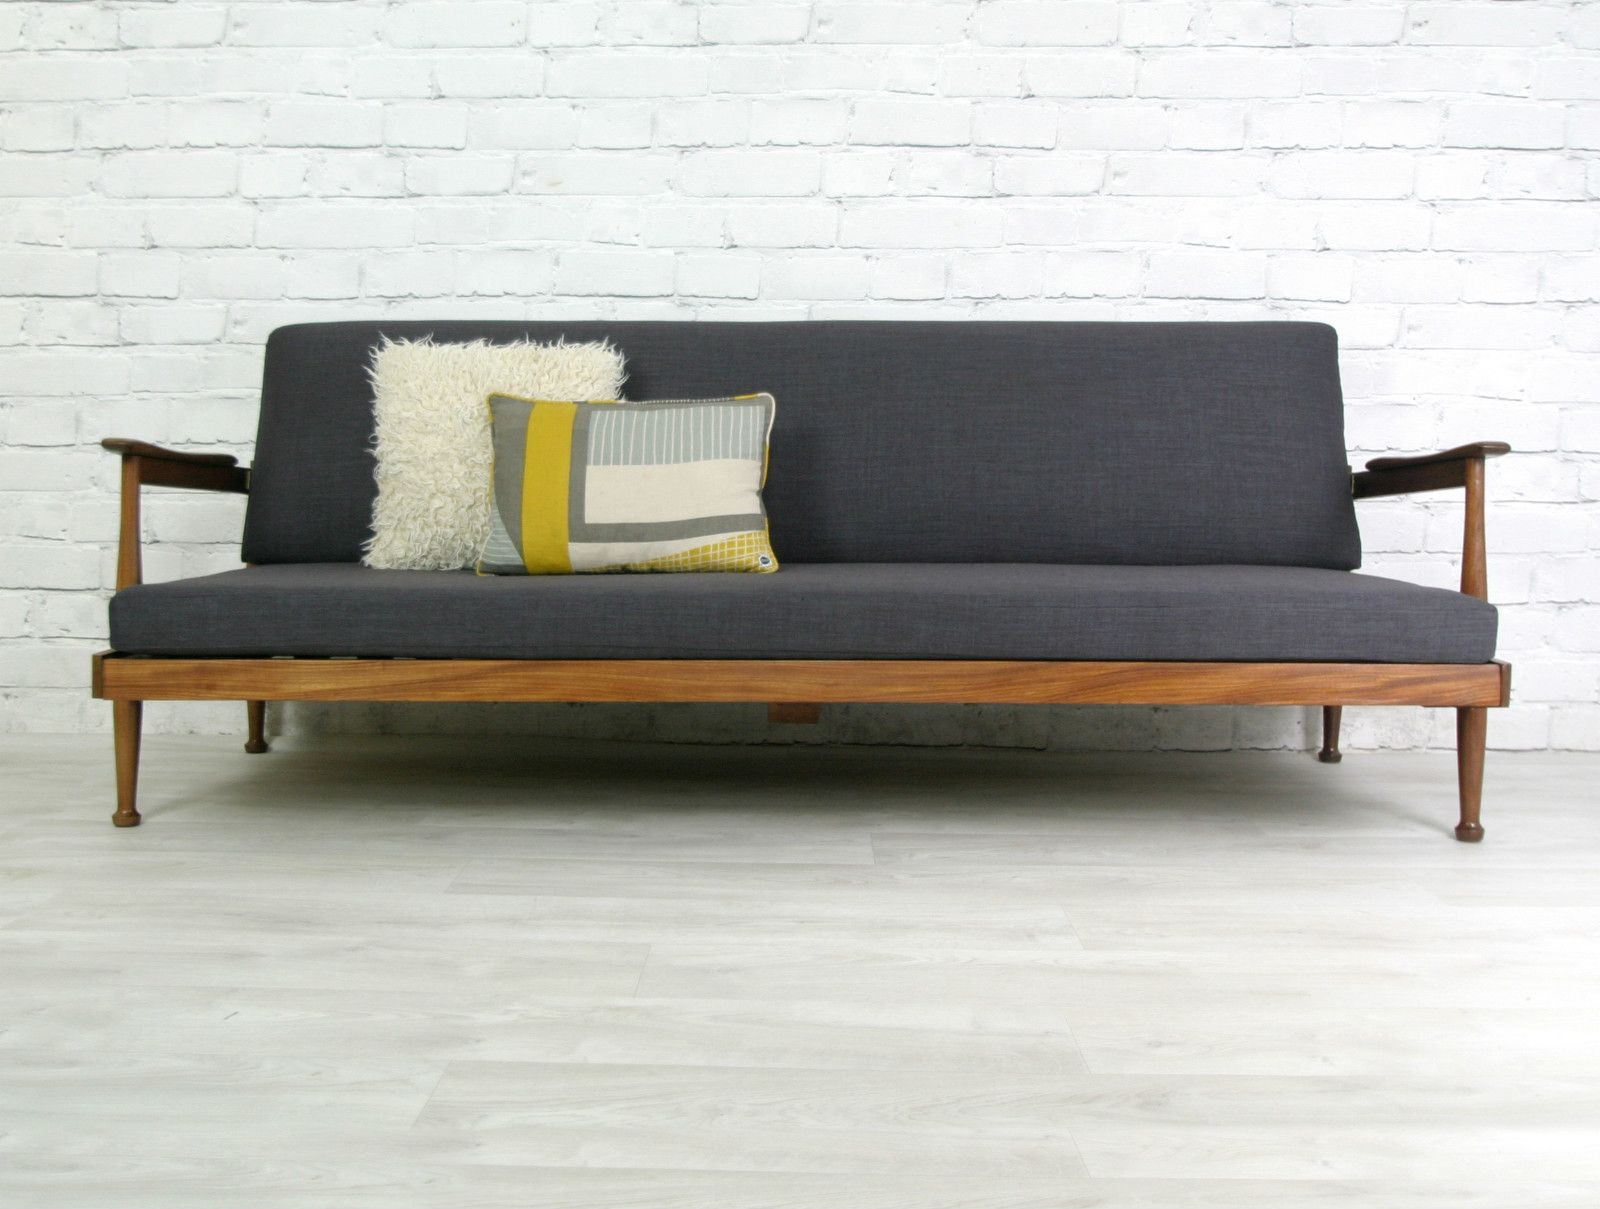 vintage retro style stunning patchwork sofa bed sears sleeper guy rogers teak mid century danish